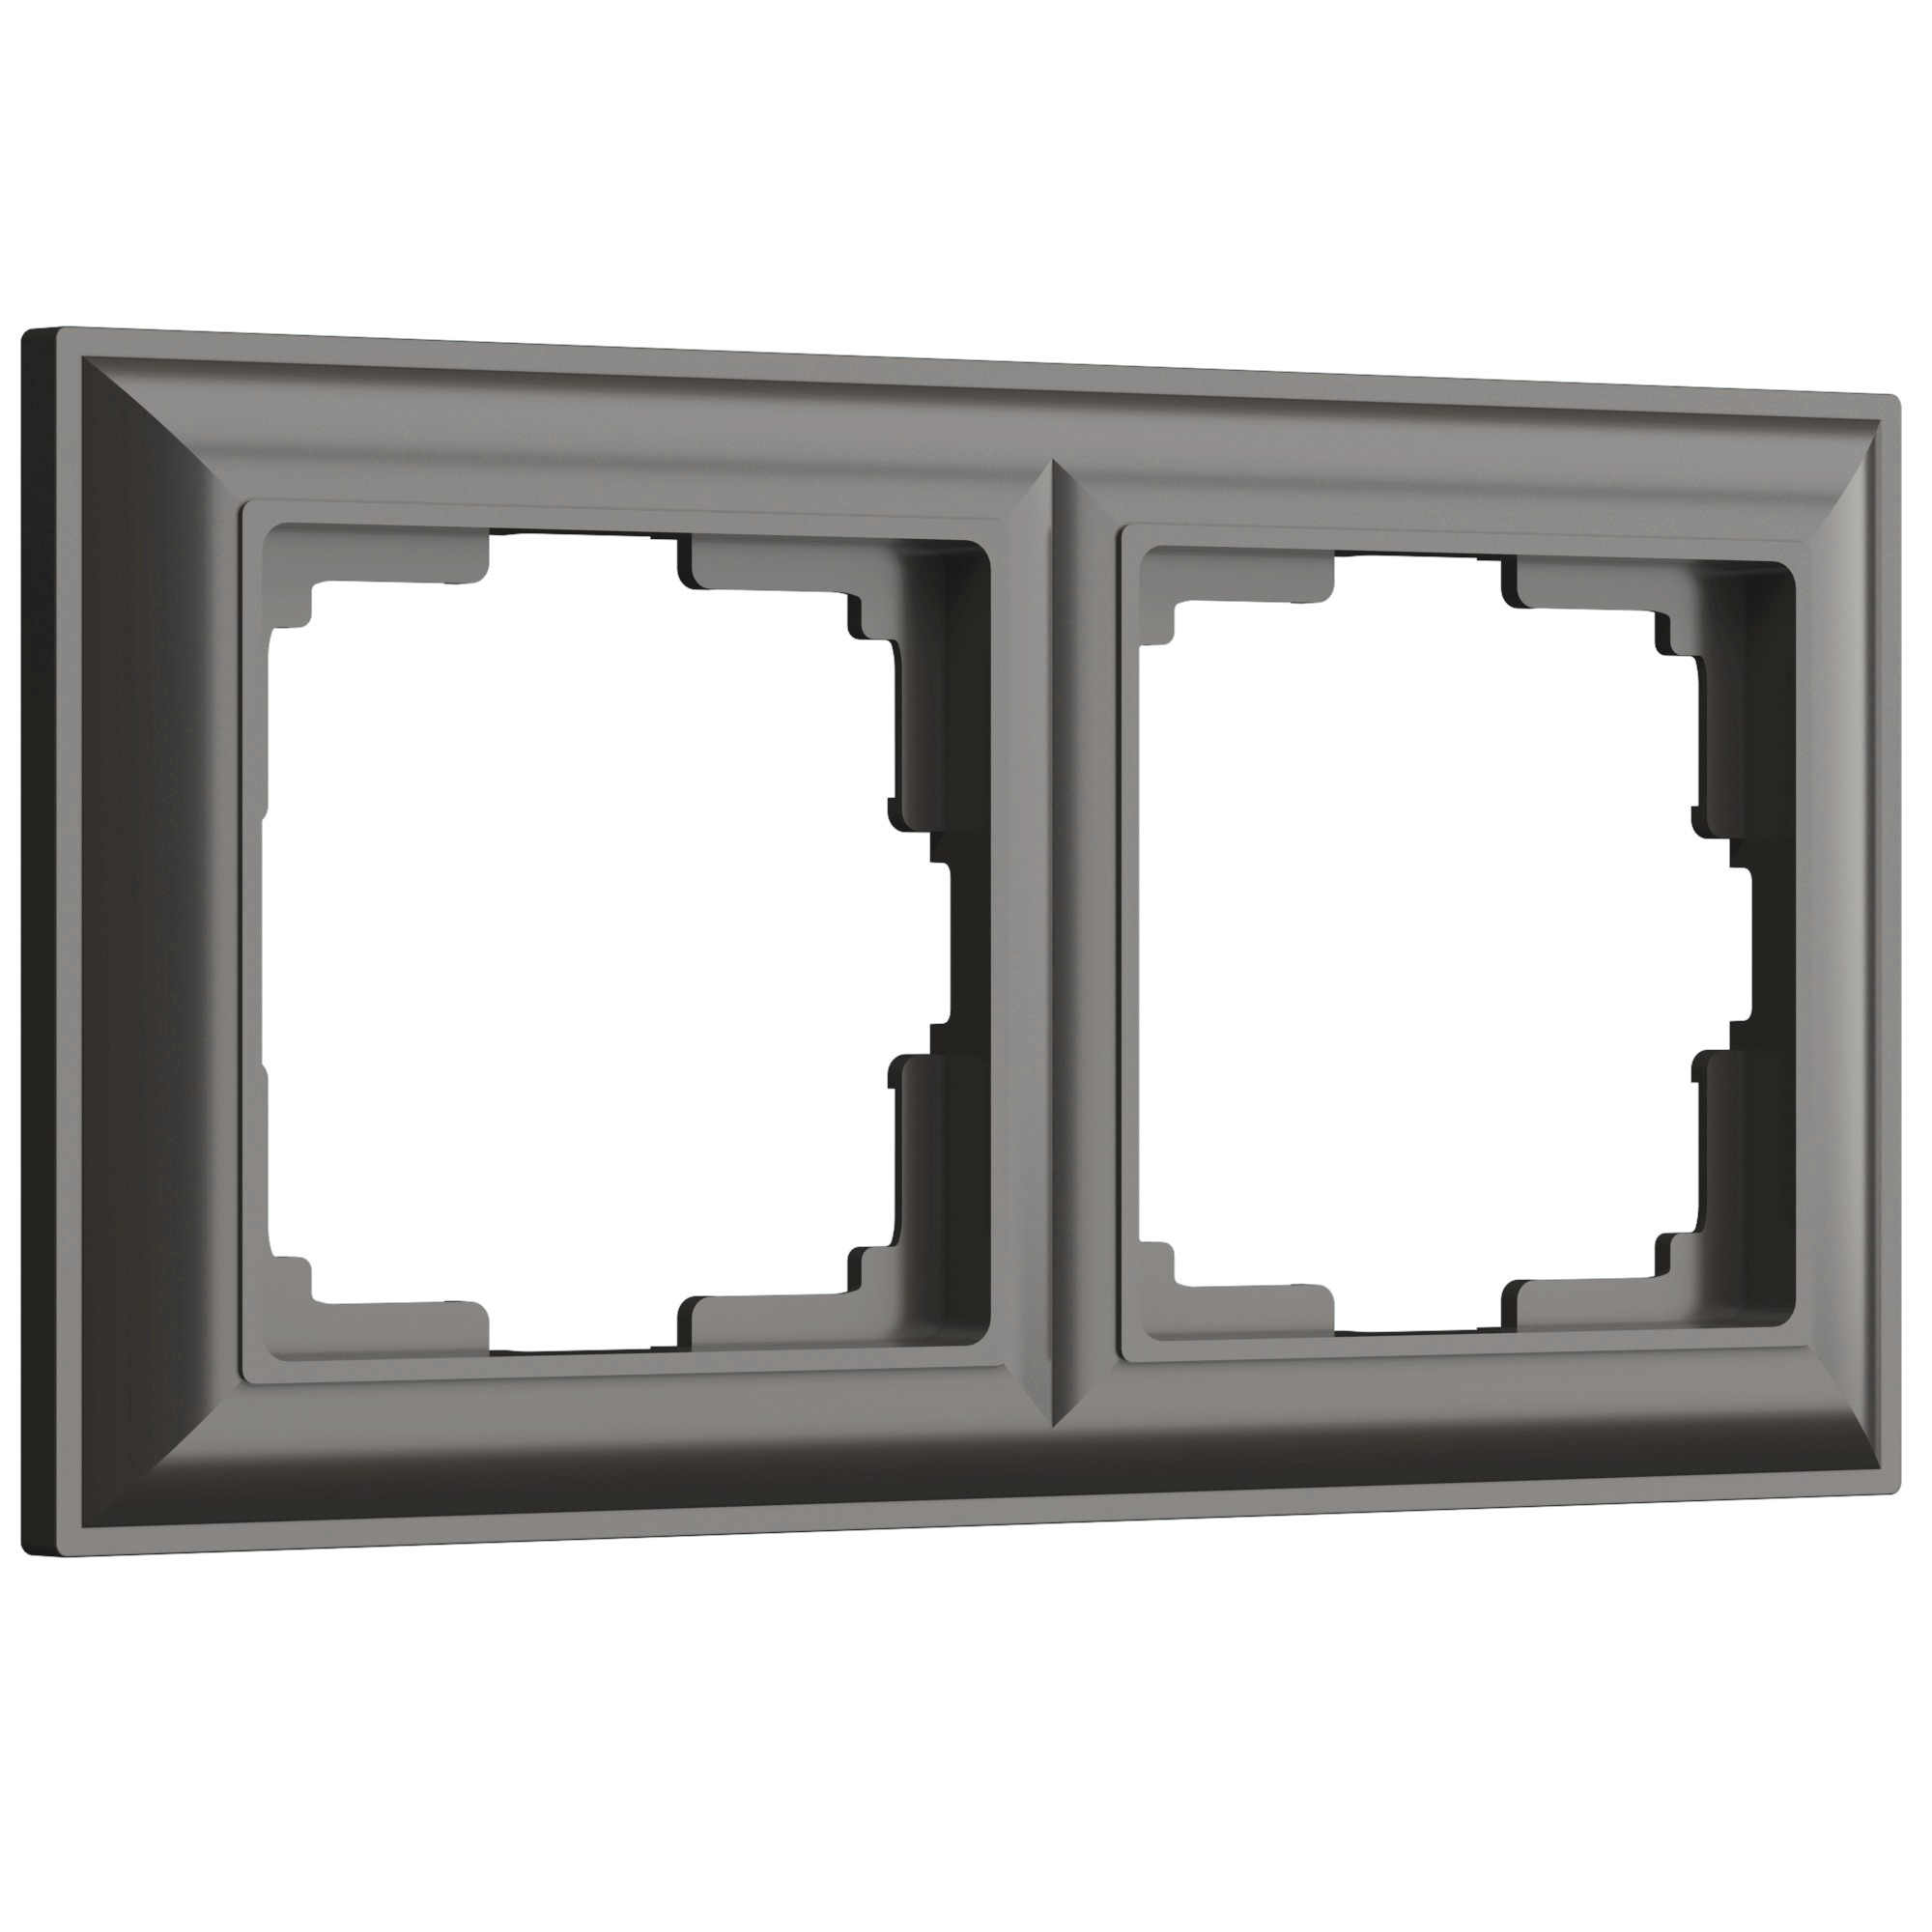 WL14-Frame-02/ Рамка на 2 поста (серо-коричневый)